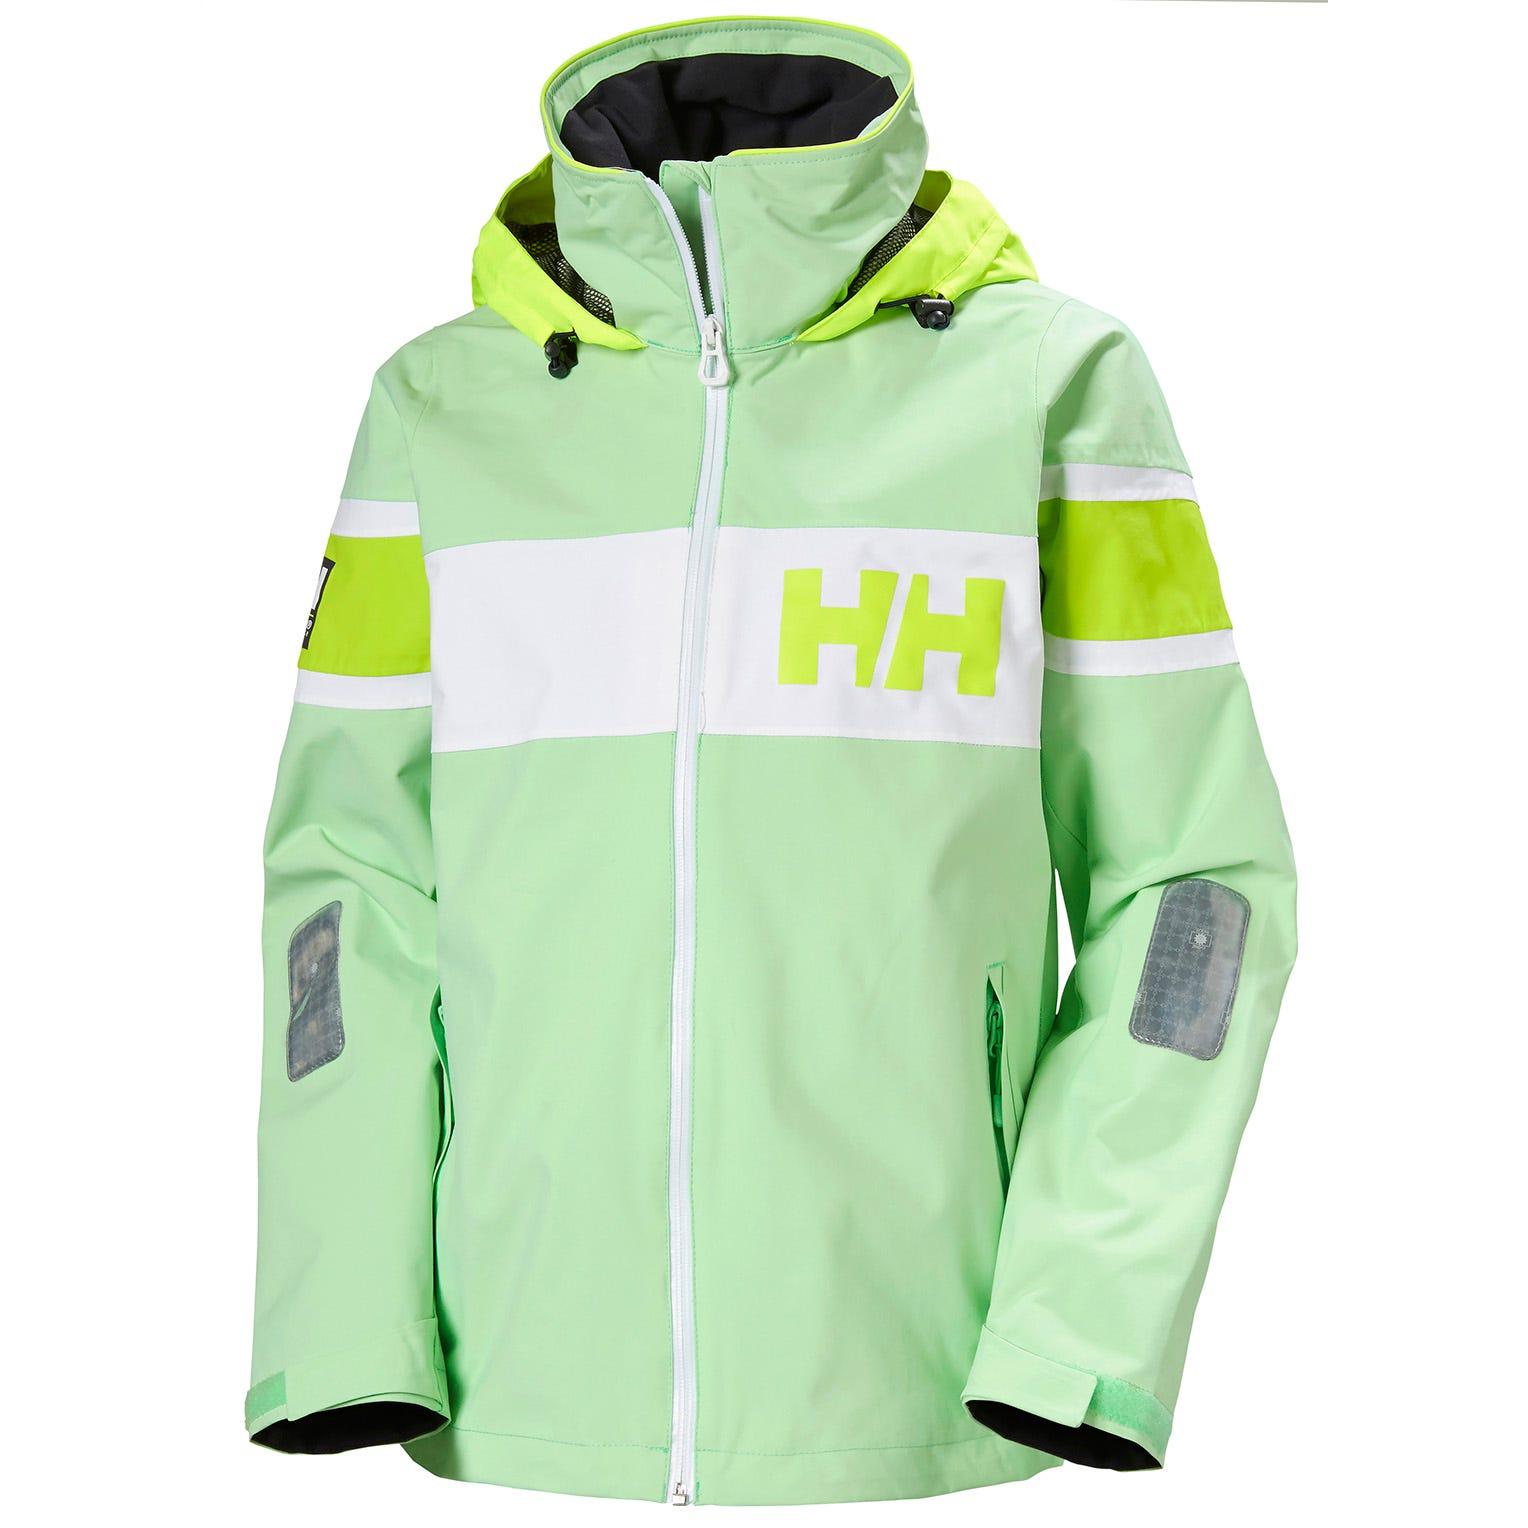 Helly Hansen Womens Sailing Jacket Green XS